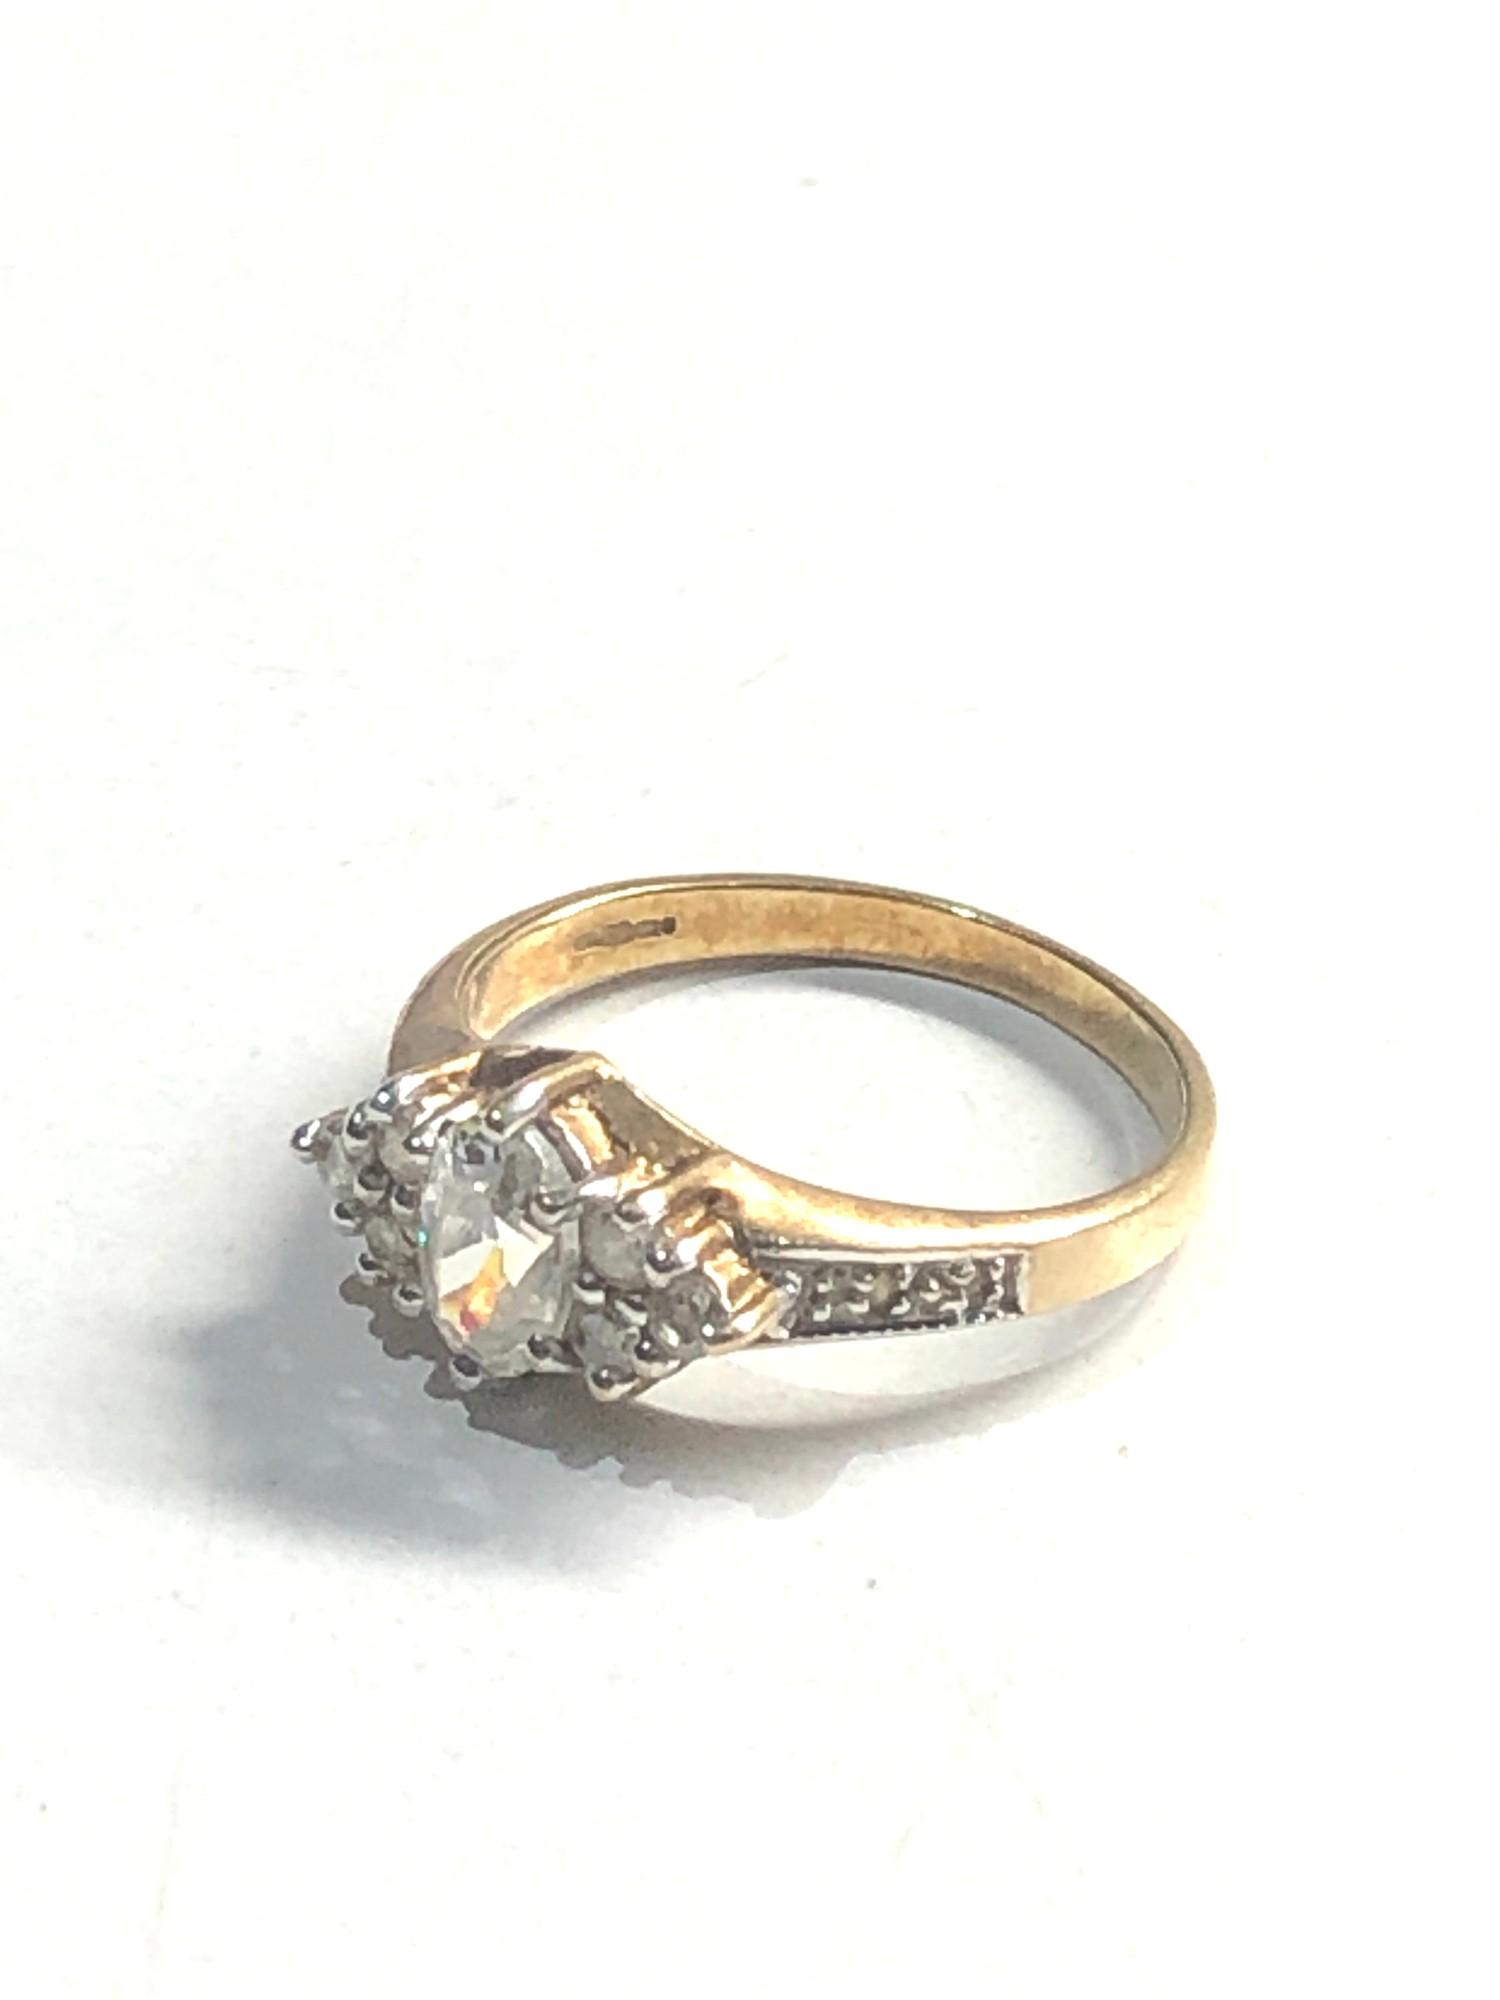 Vintage 9ct gold diamond shouldered ring 1.9g - Image 2 of 3